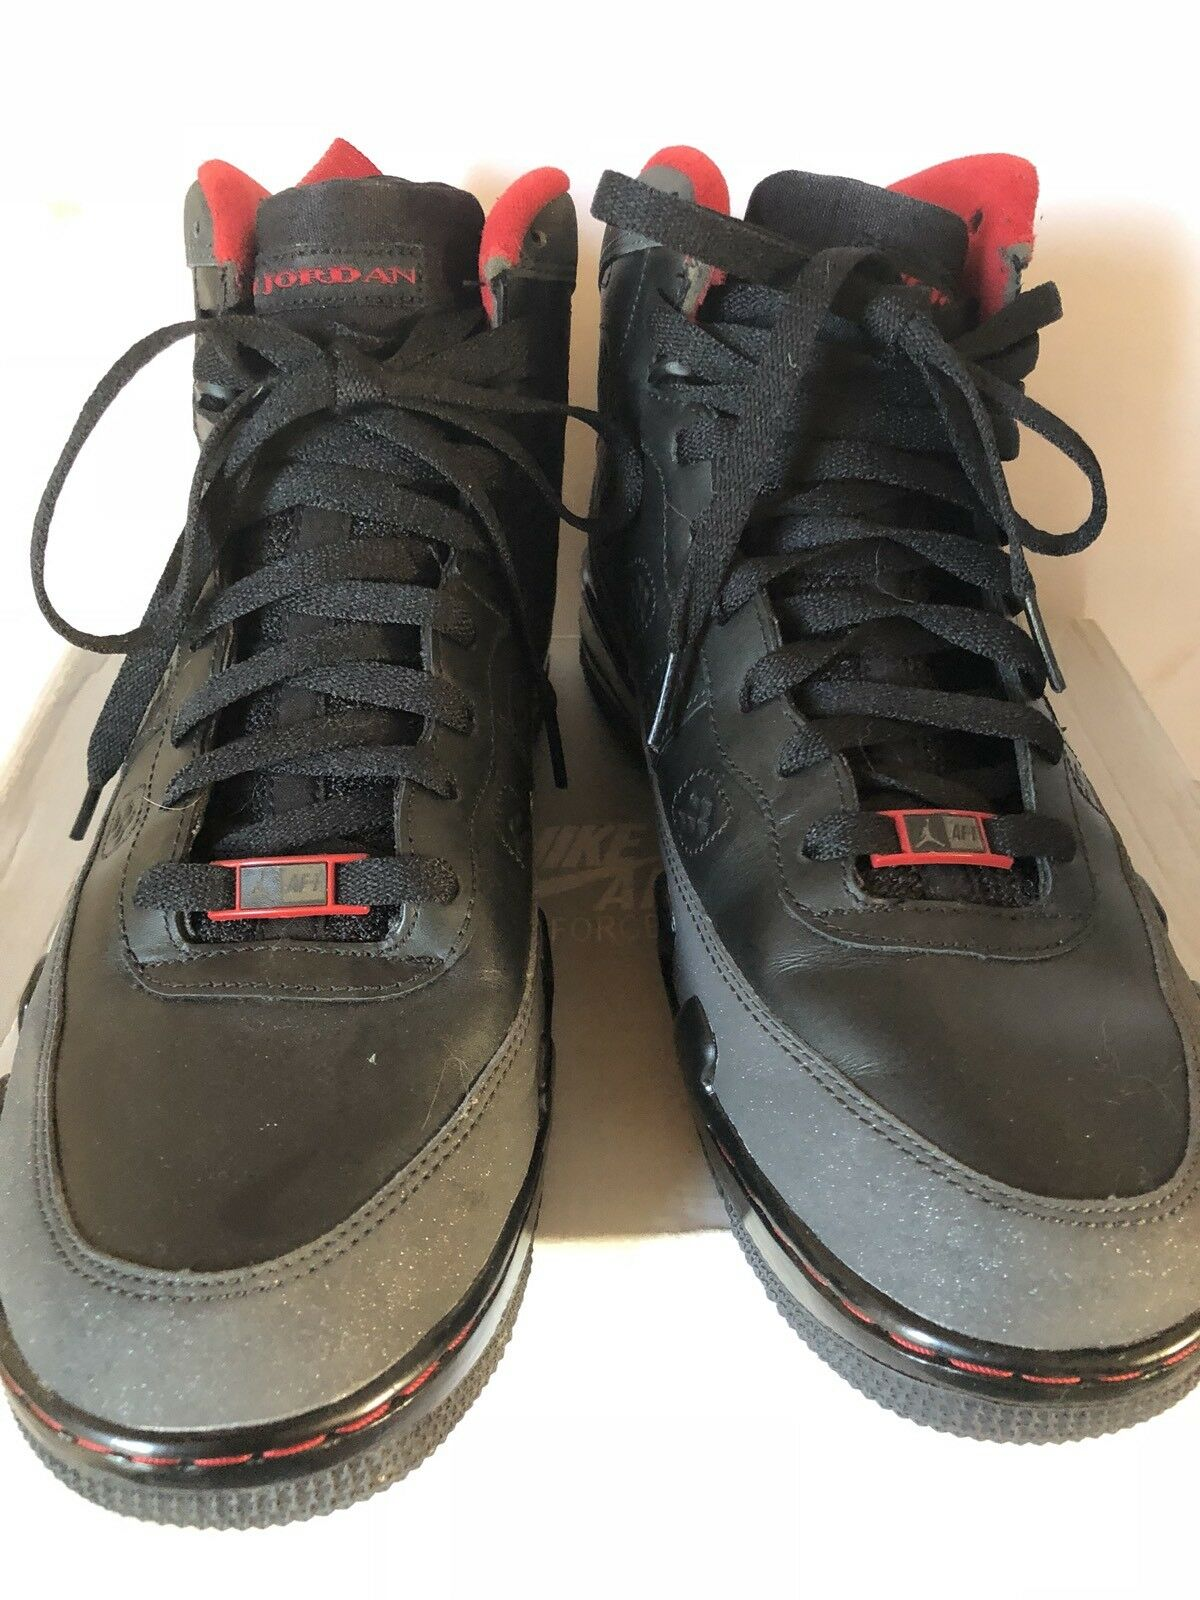 NIKE JORDAN shoes for men, US size 10